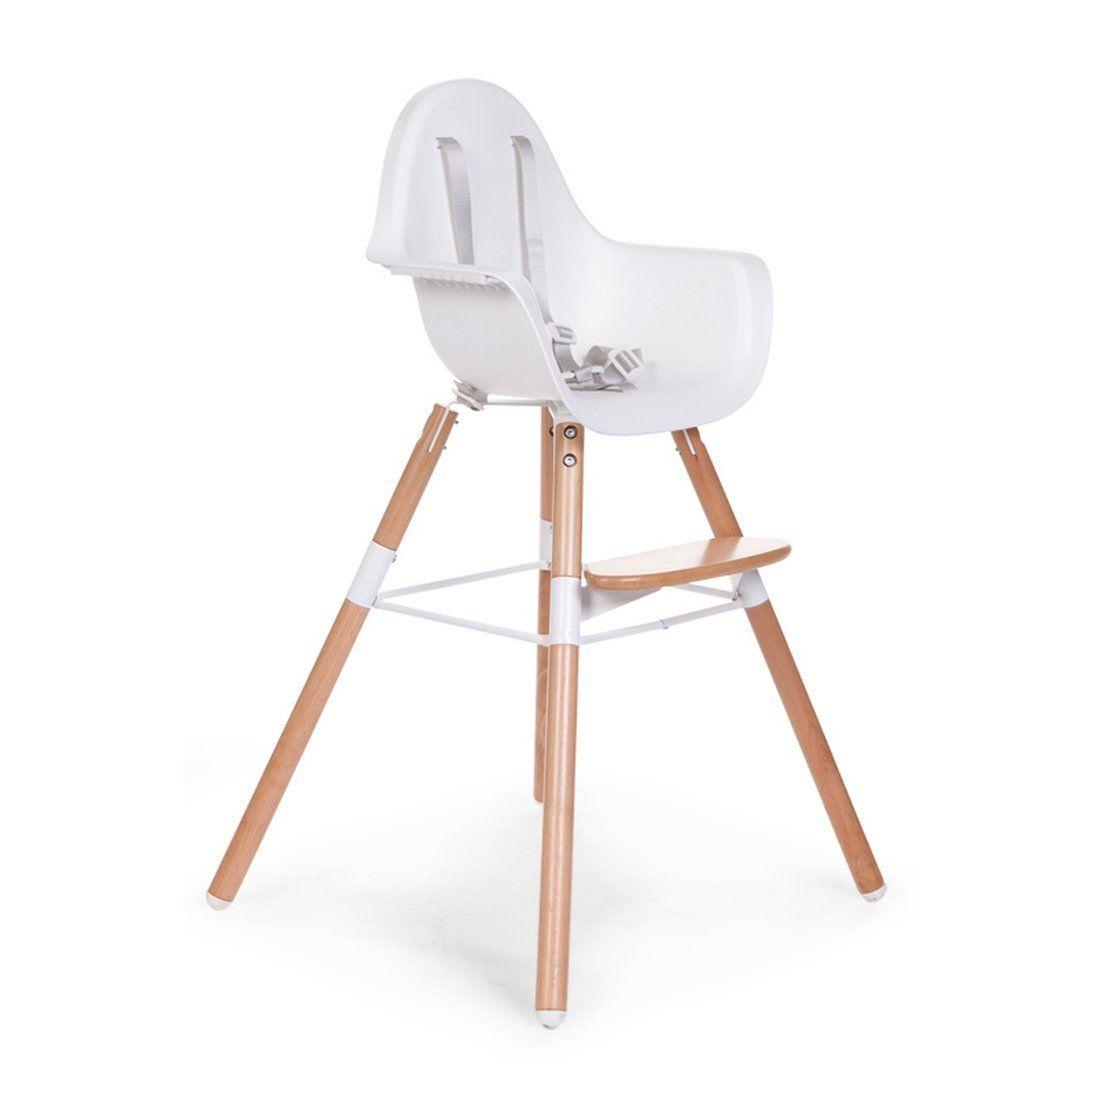 Chaise haute Bébé Evolu CHILDWOOD